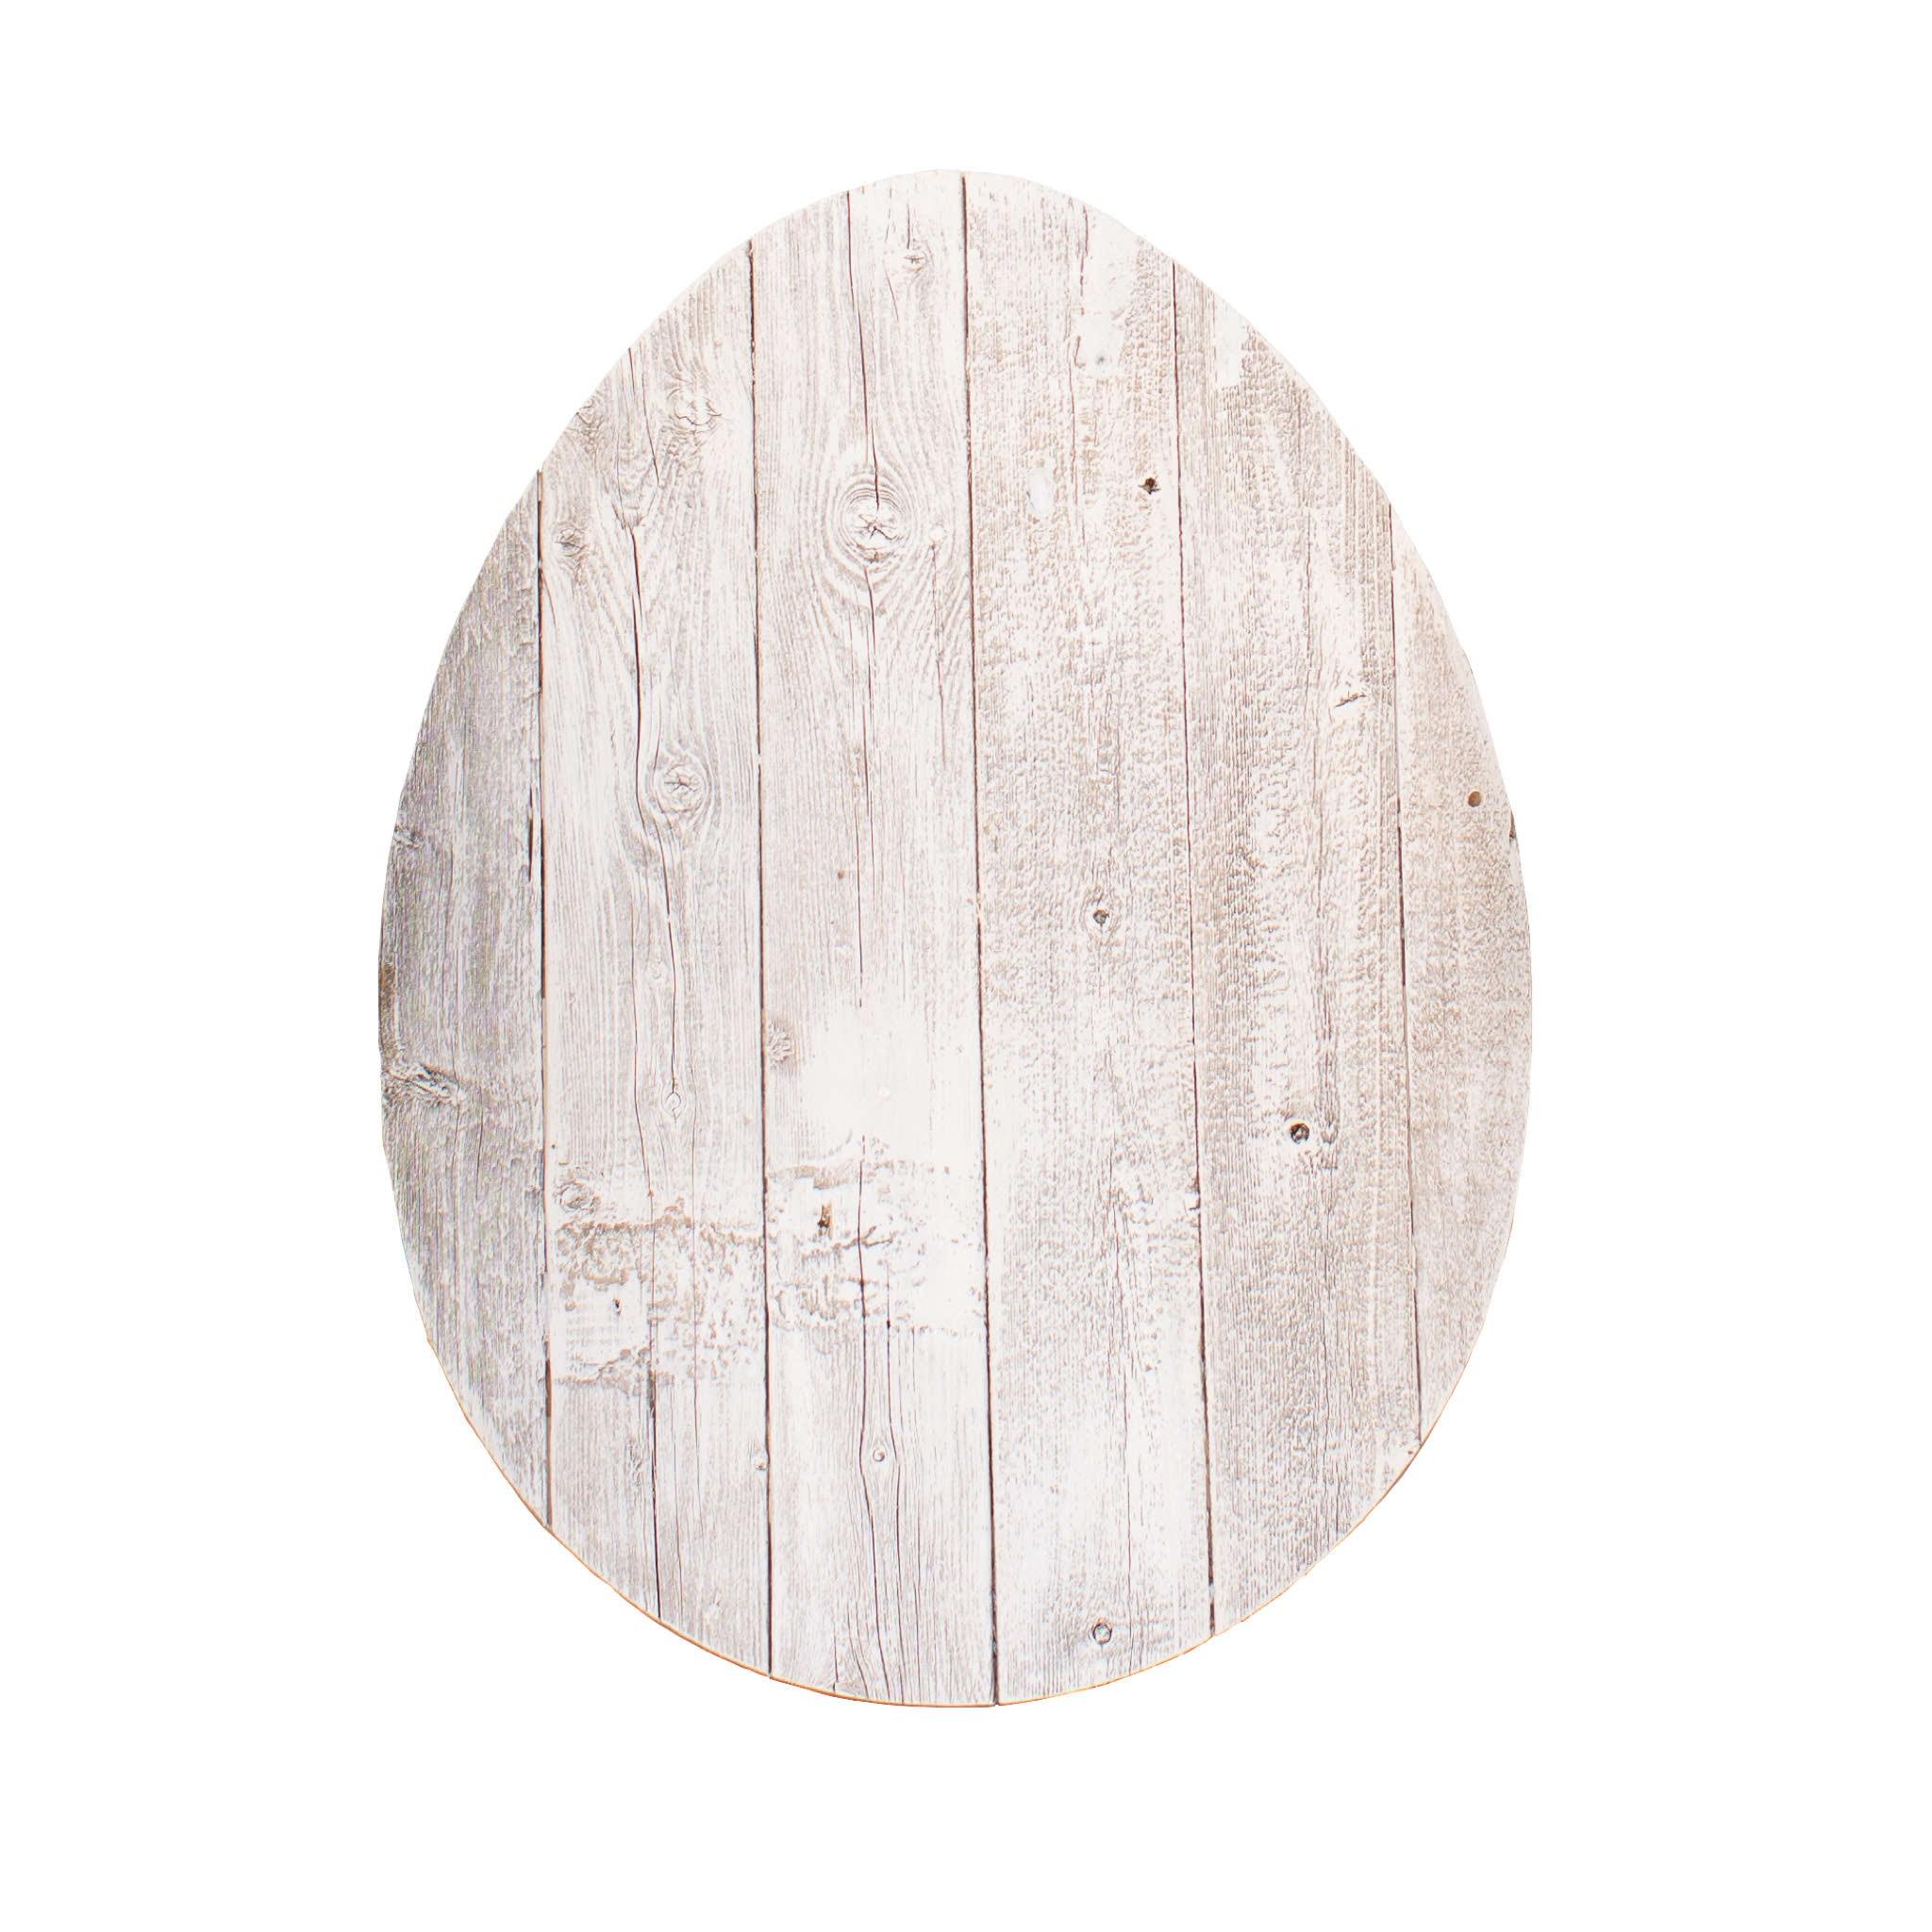 "18"" Rustic Farmhouse White Wash Wood Large Egg"